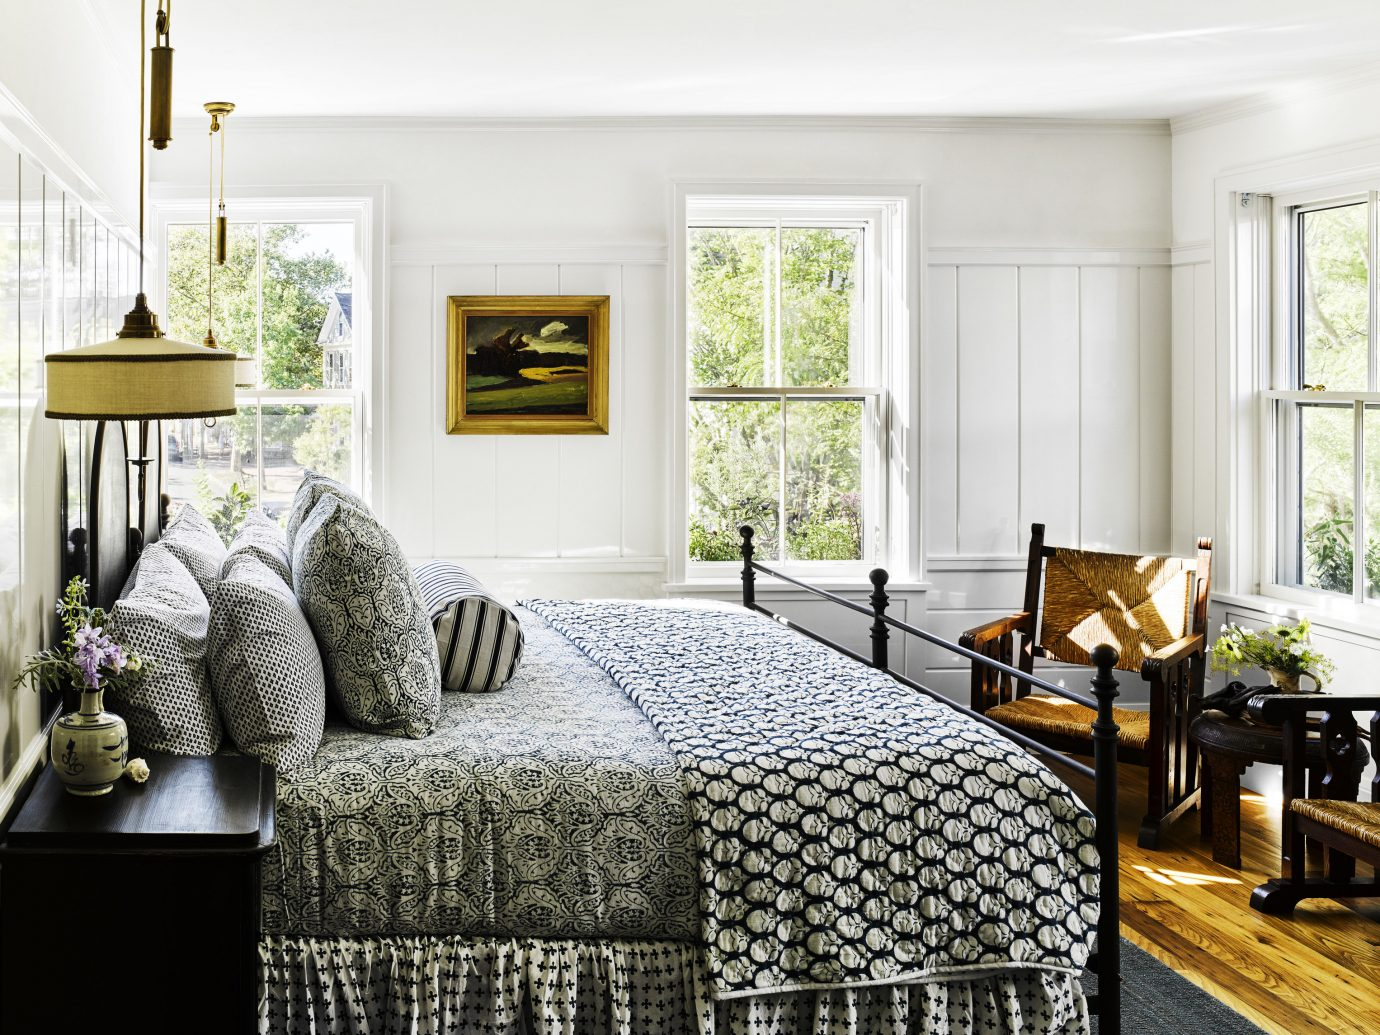 Trip Ideas indoor living room floor room window interior design Living home bed frame furniture Bedroom interior designer linens